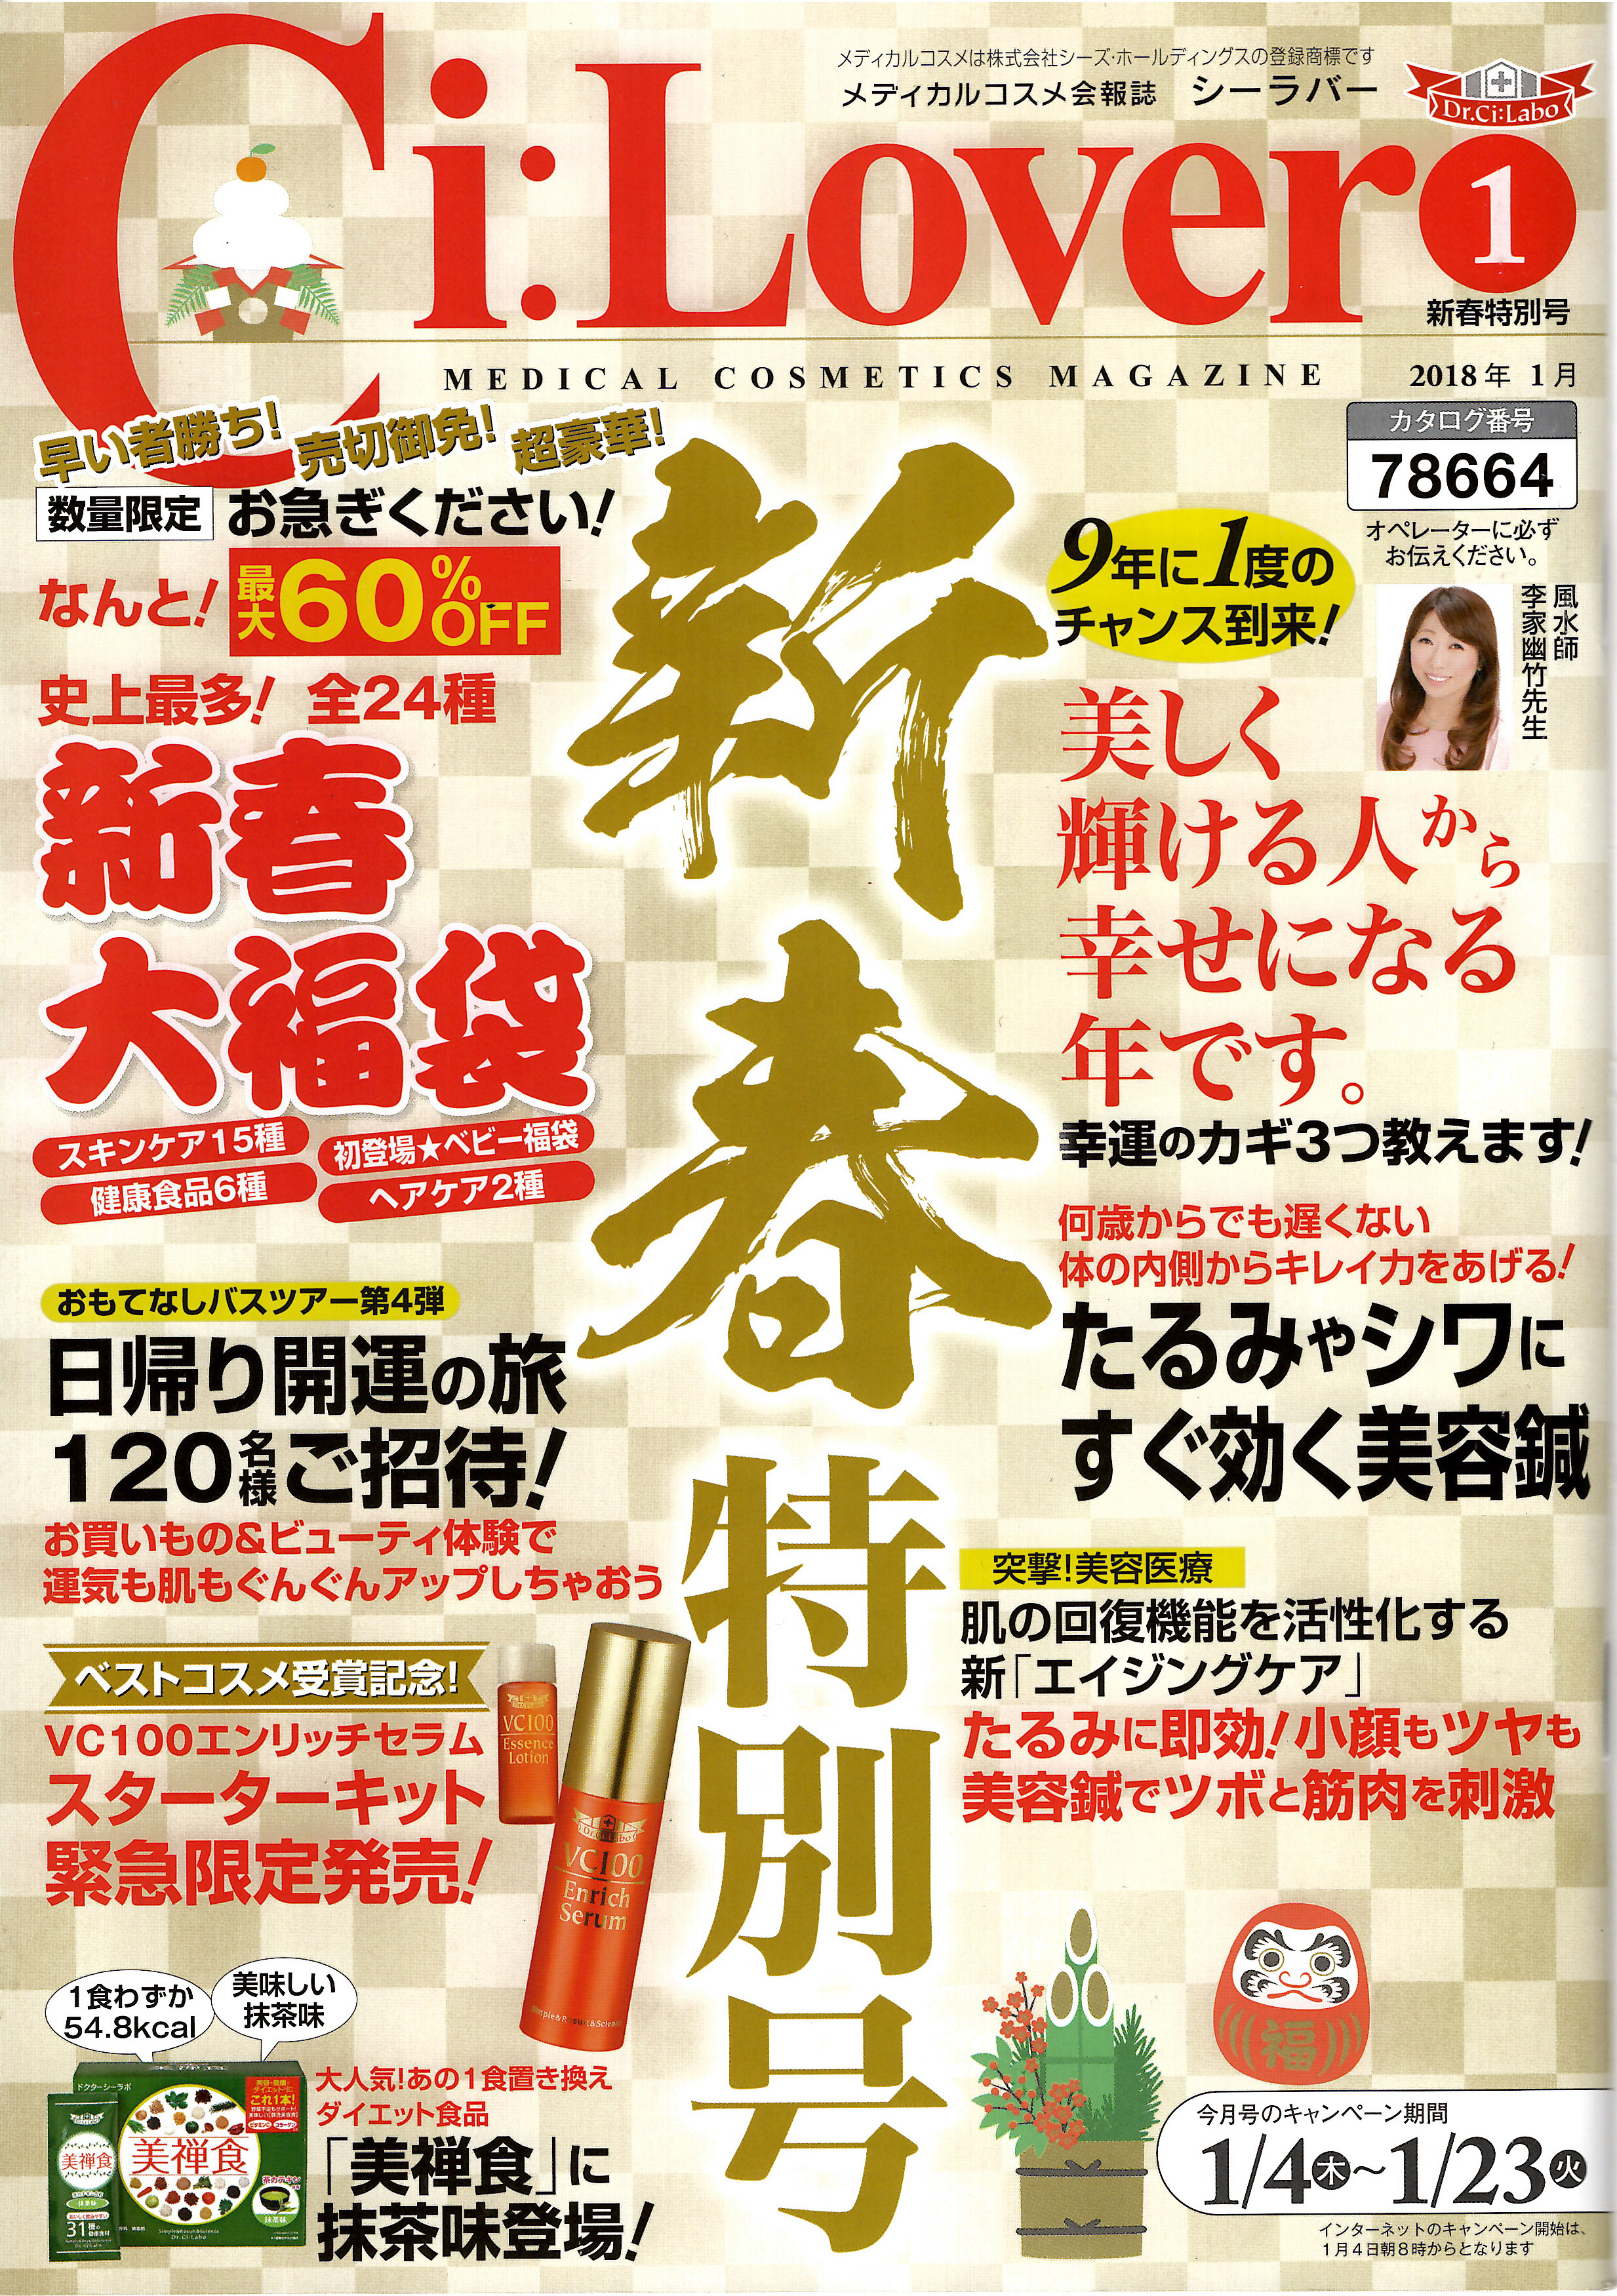 「Ci:Lover(シーラバー)」新春特別号で寝かせ玄米ごはんパックをご紹介いただきました!